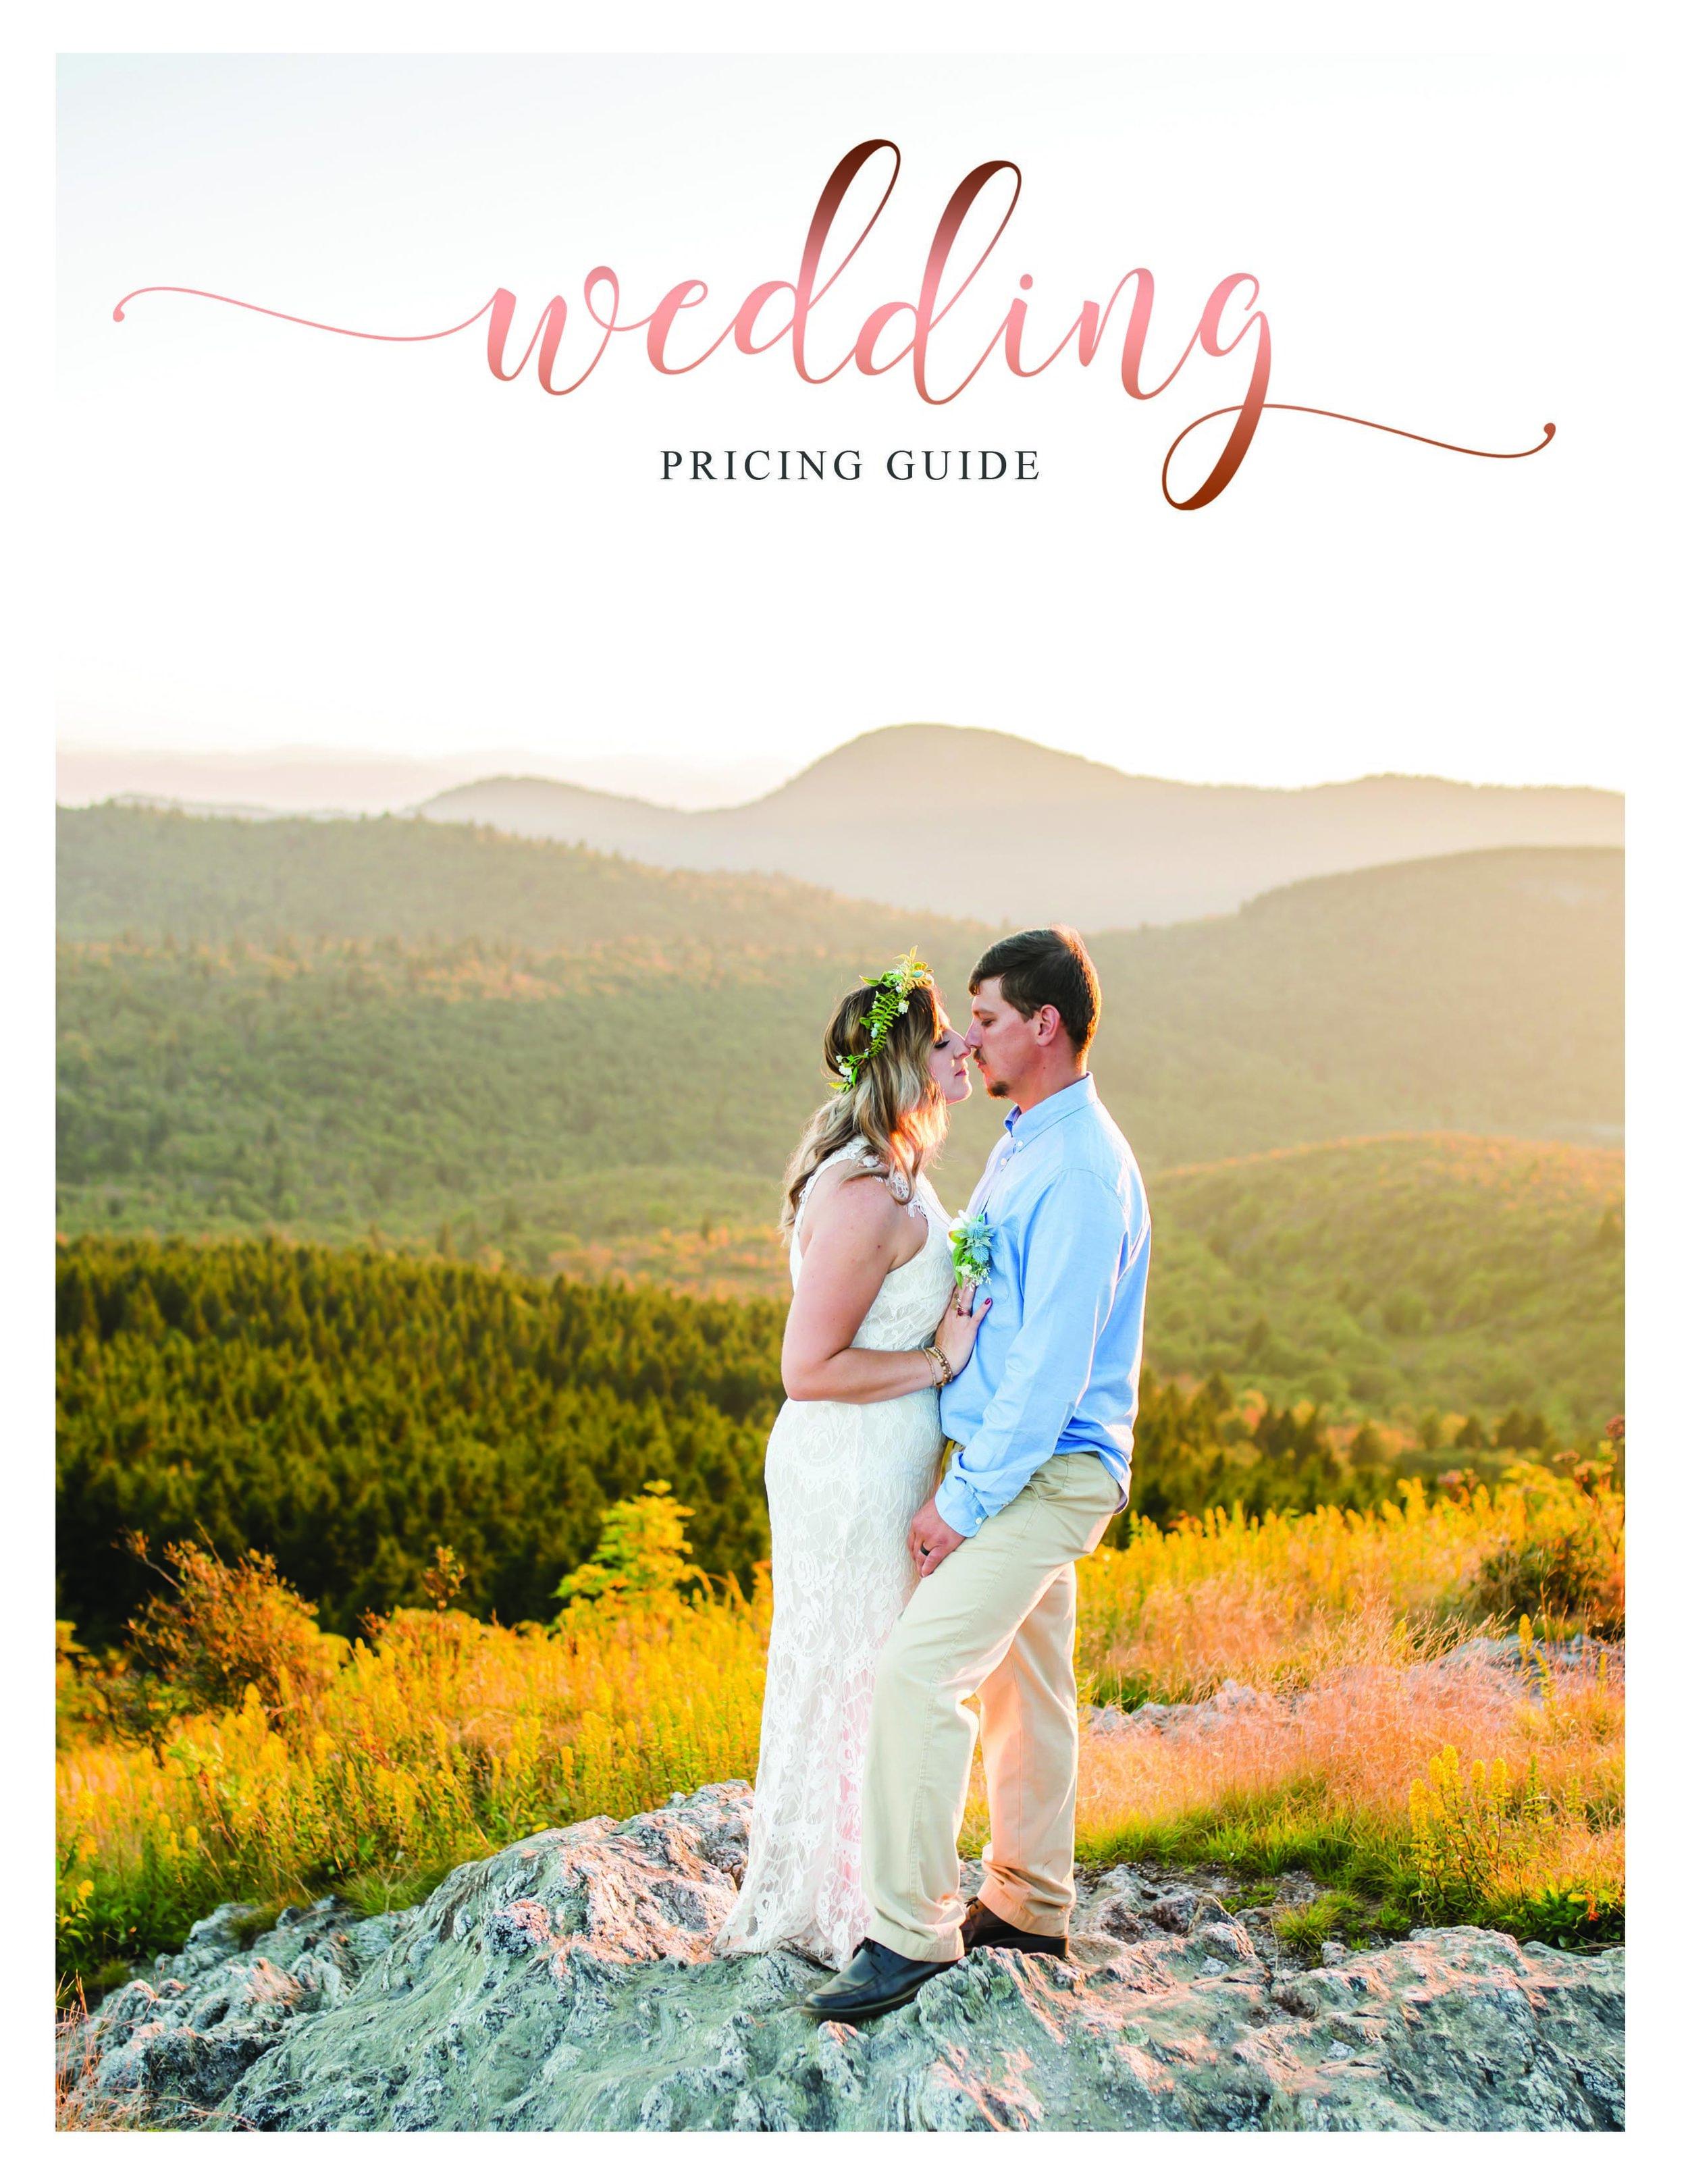 Wedding Pricing Guide.jpg